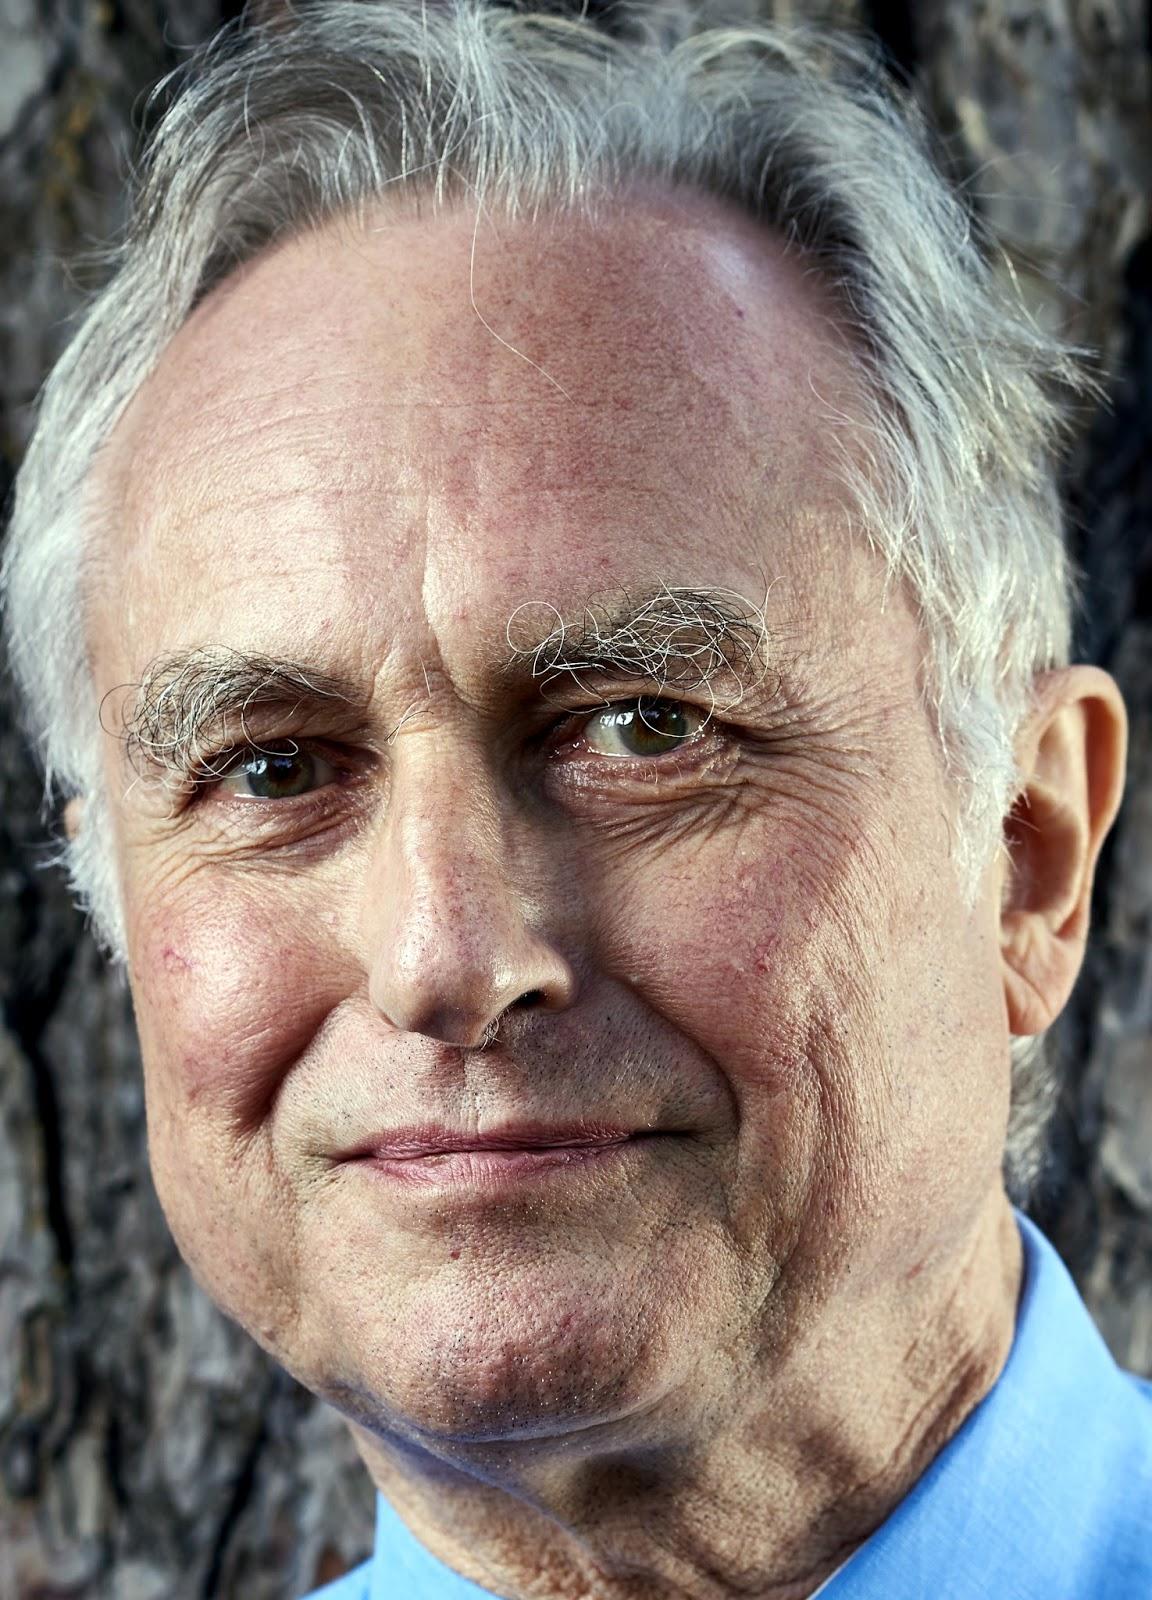 Amanda Dawkins